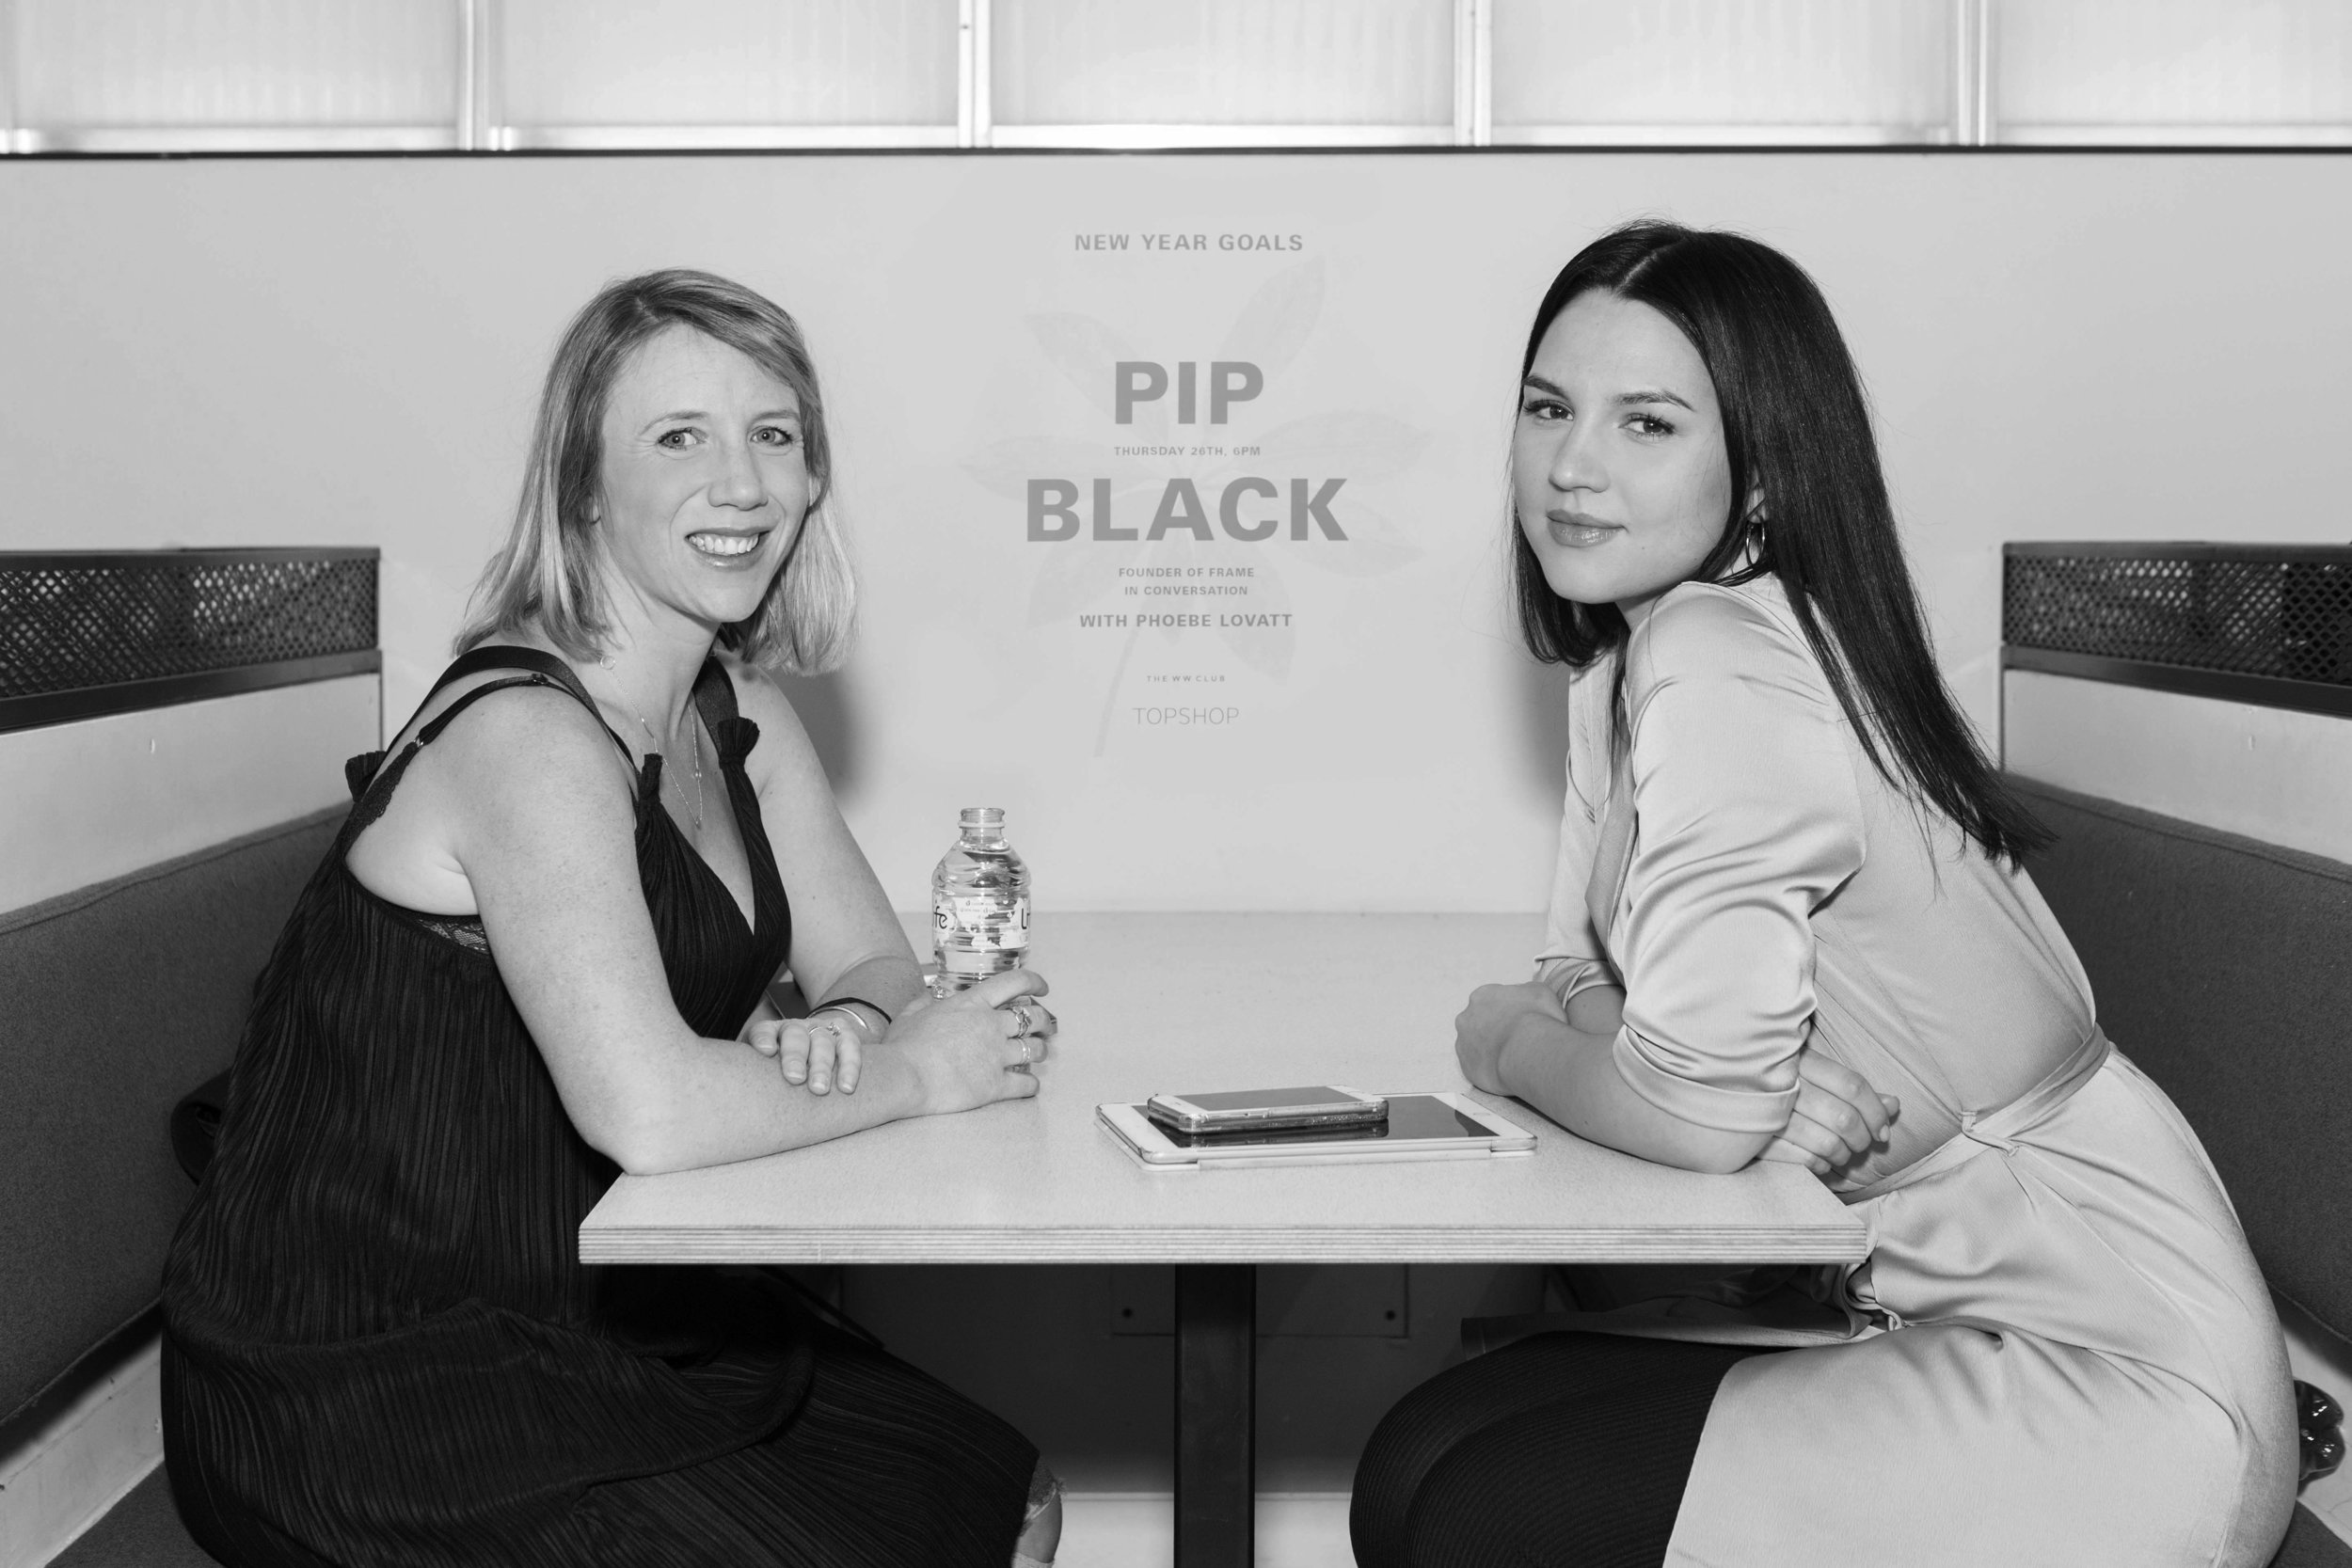 Pip BLack, Co-Founder,Frame - The WW Club @ TOPSHOP